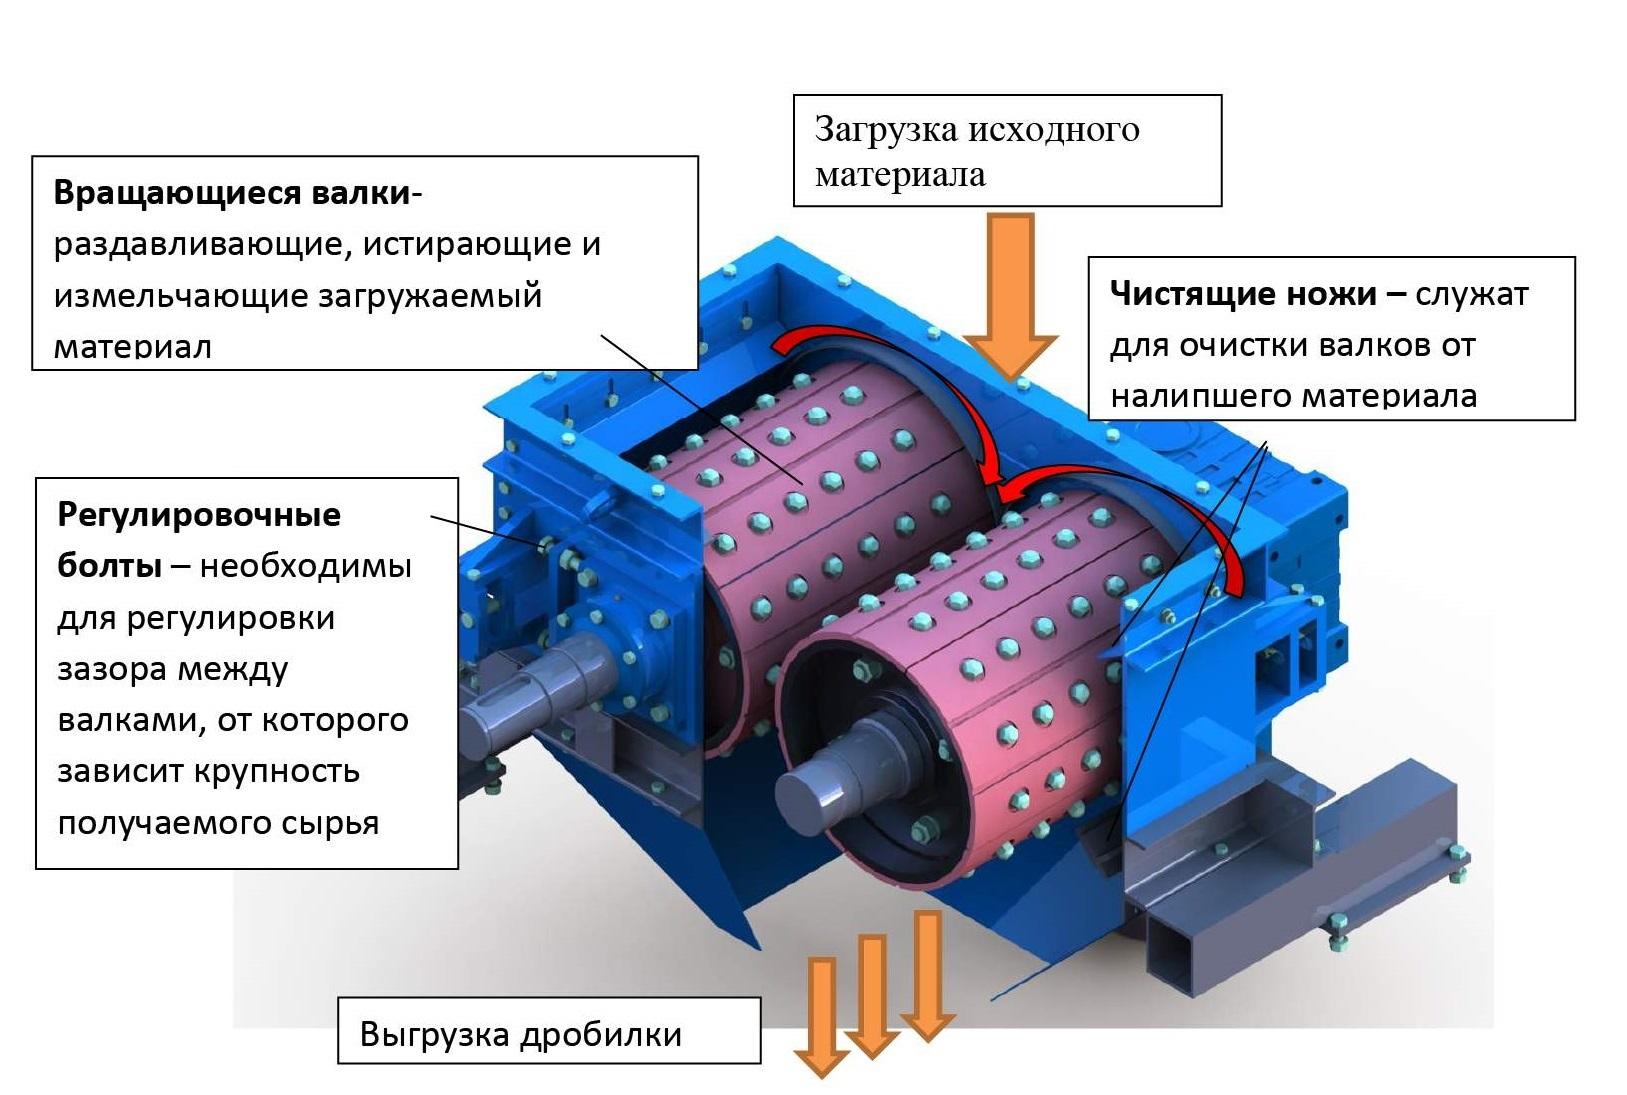 Валковая дробилка технические характеристики гил-42 чертежи